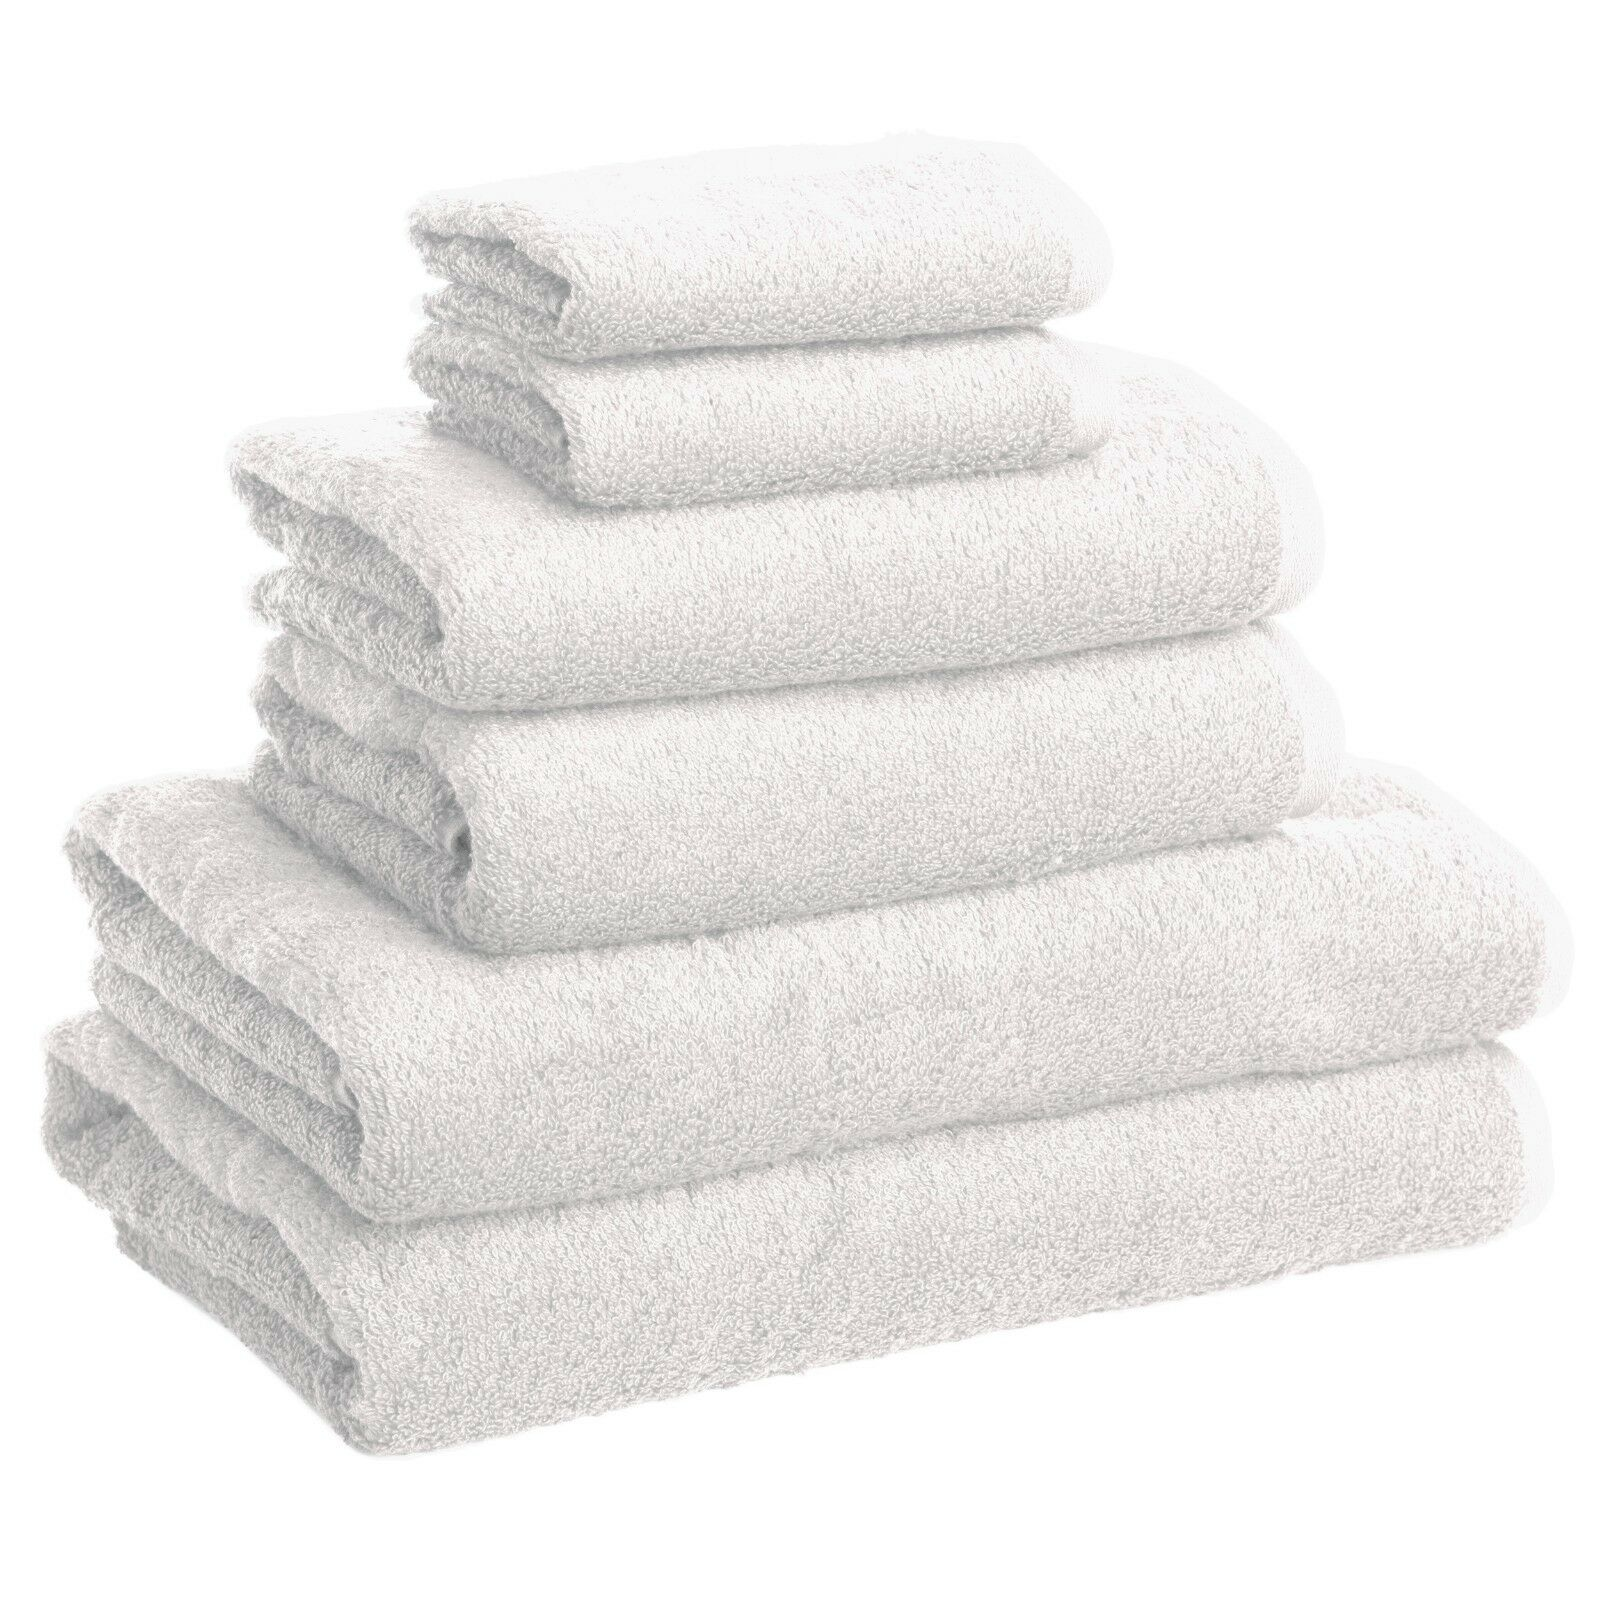 Vossen Weiß 100% 100% 100% Super Soft Cotton Towels With AIRpillow Technology 450542